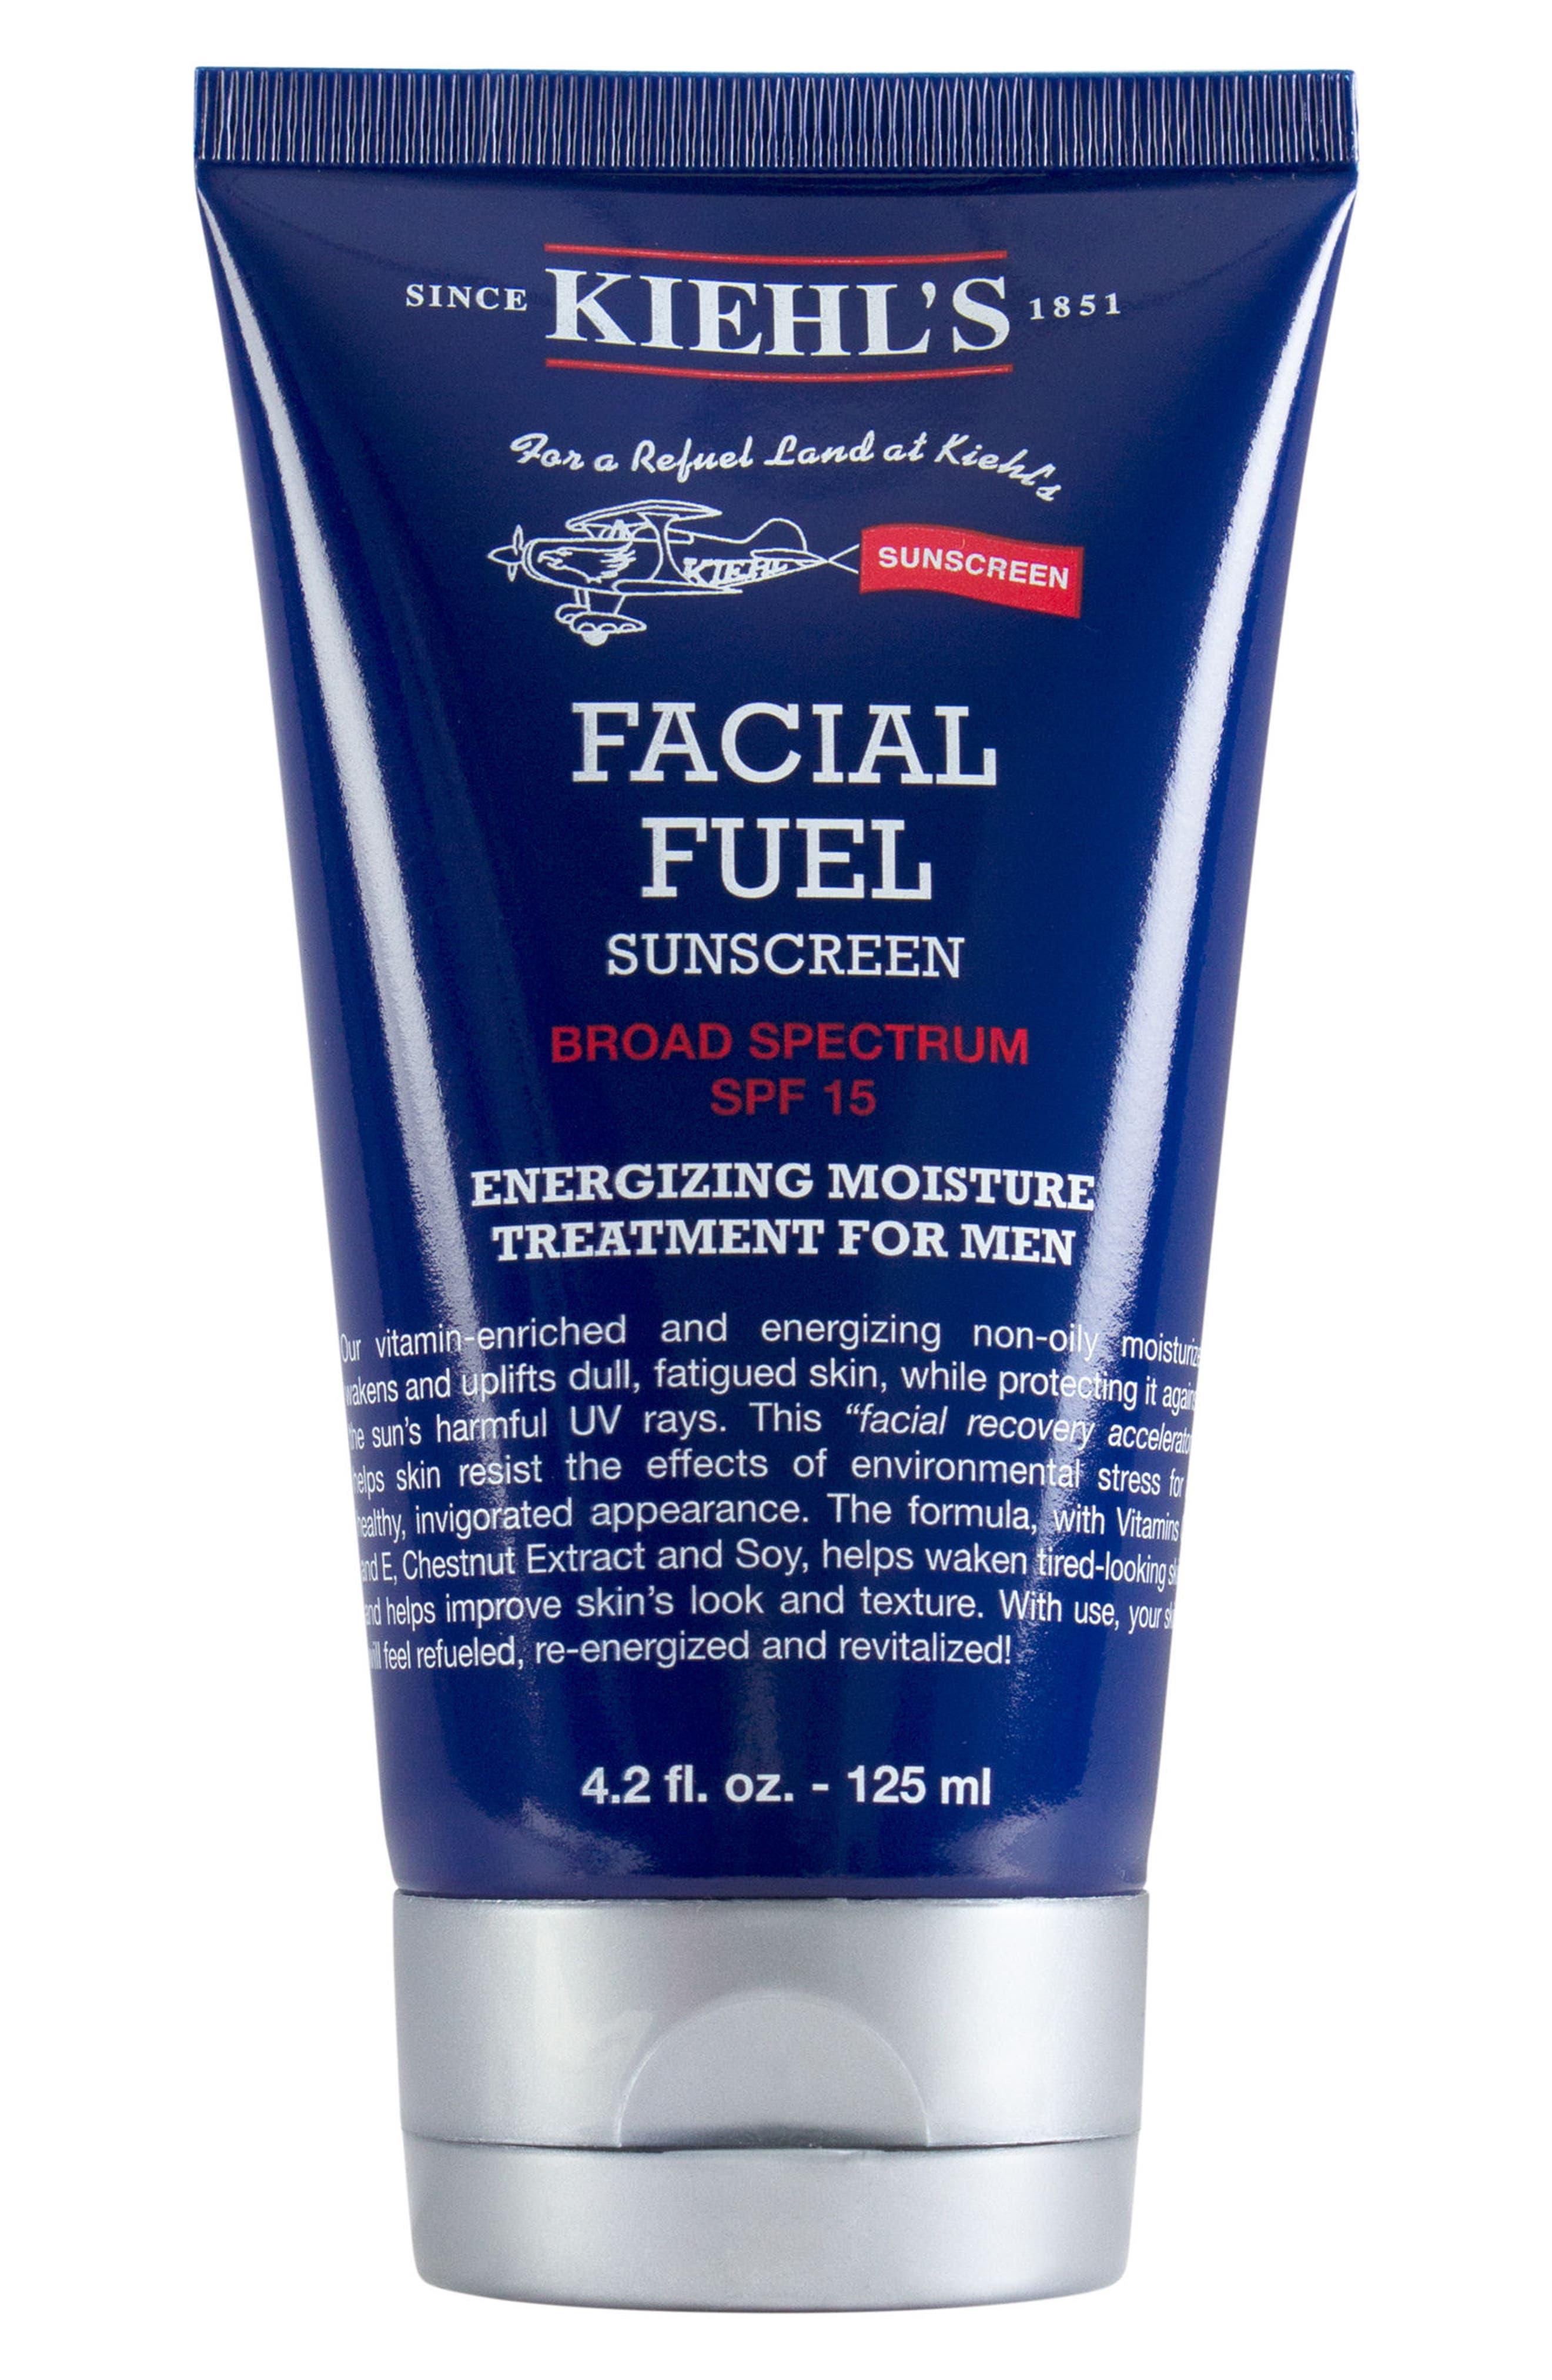 KIEHL'S SINCE 1851,                             Facial Fuel Energizing Moisture Treatment for Men SPF 15,                             Main thumbnail 1, color,                             000